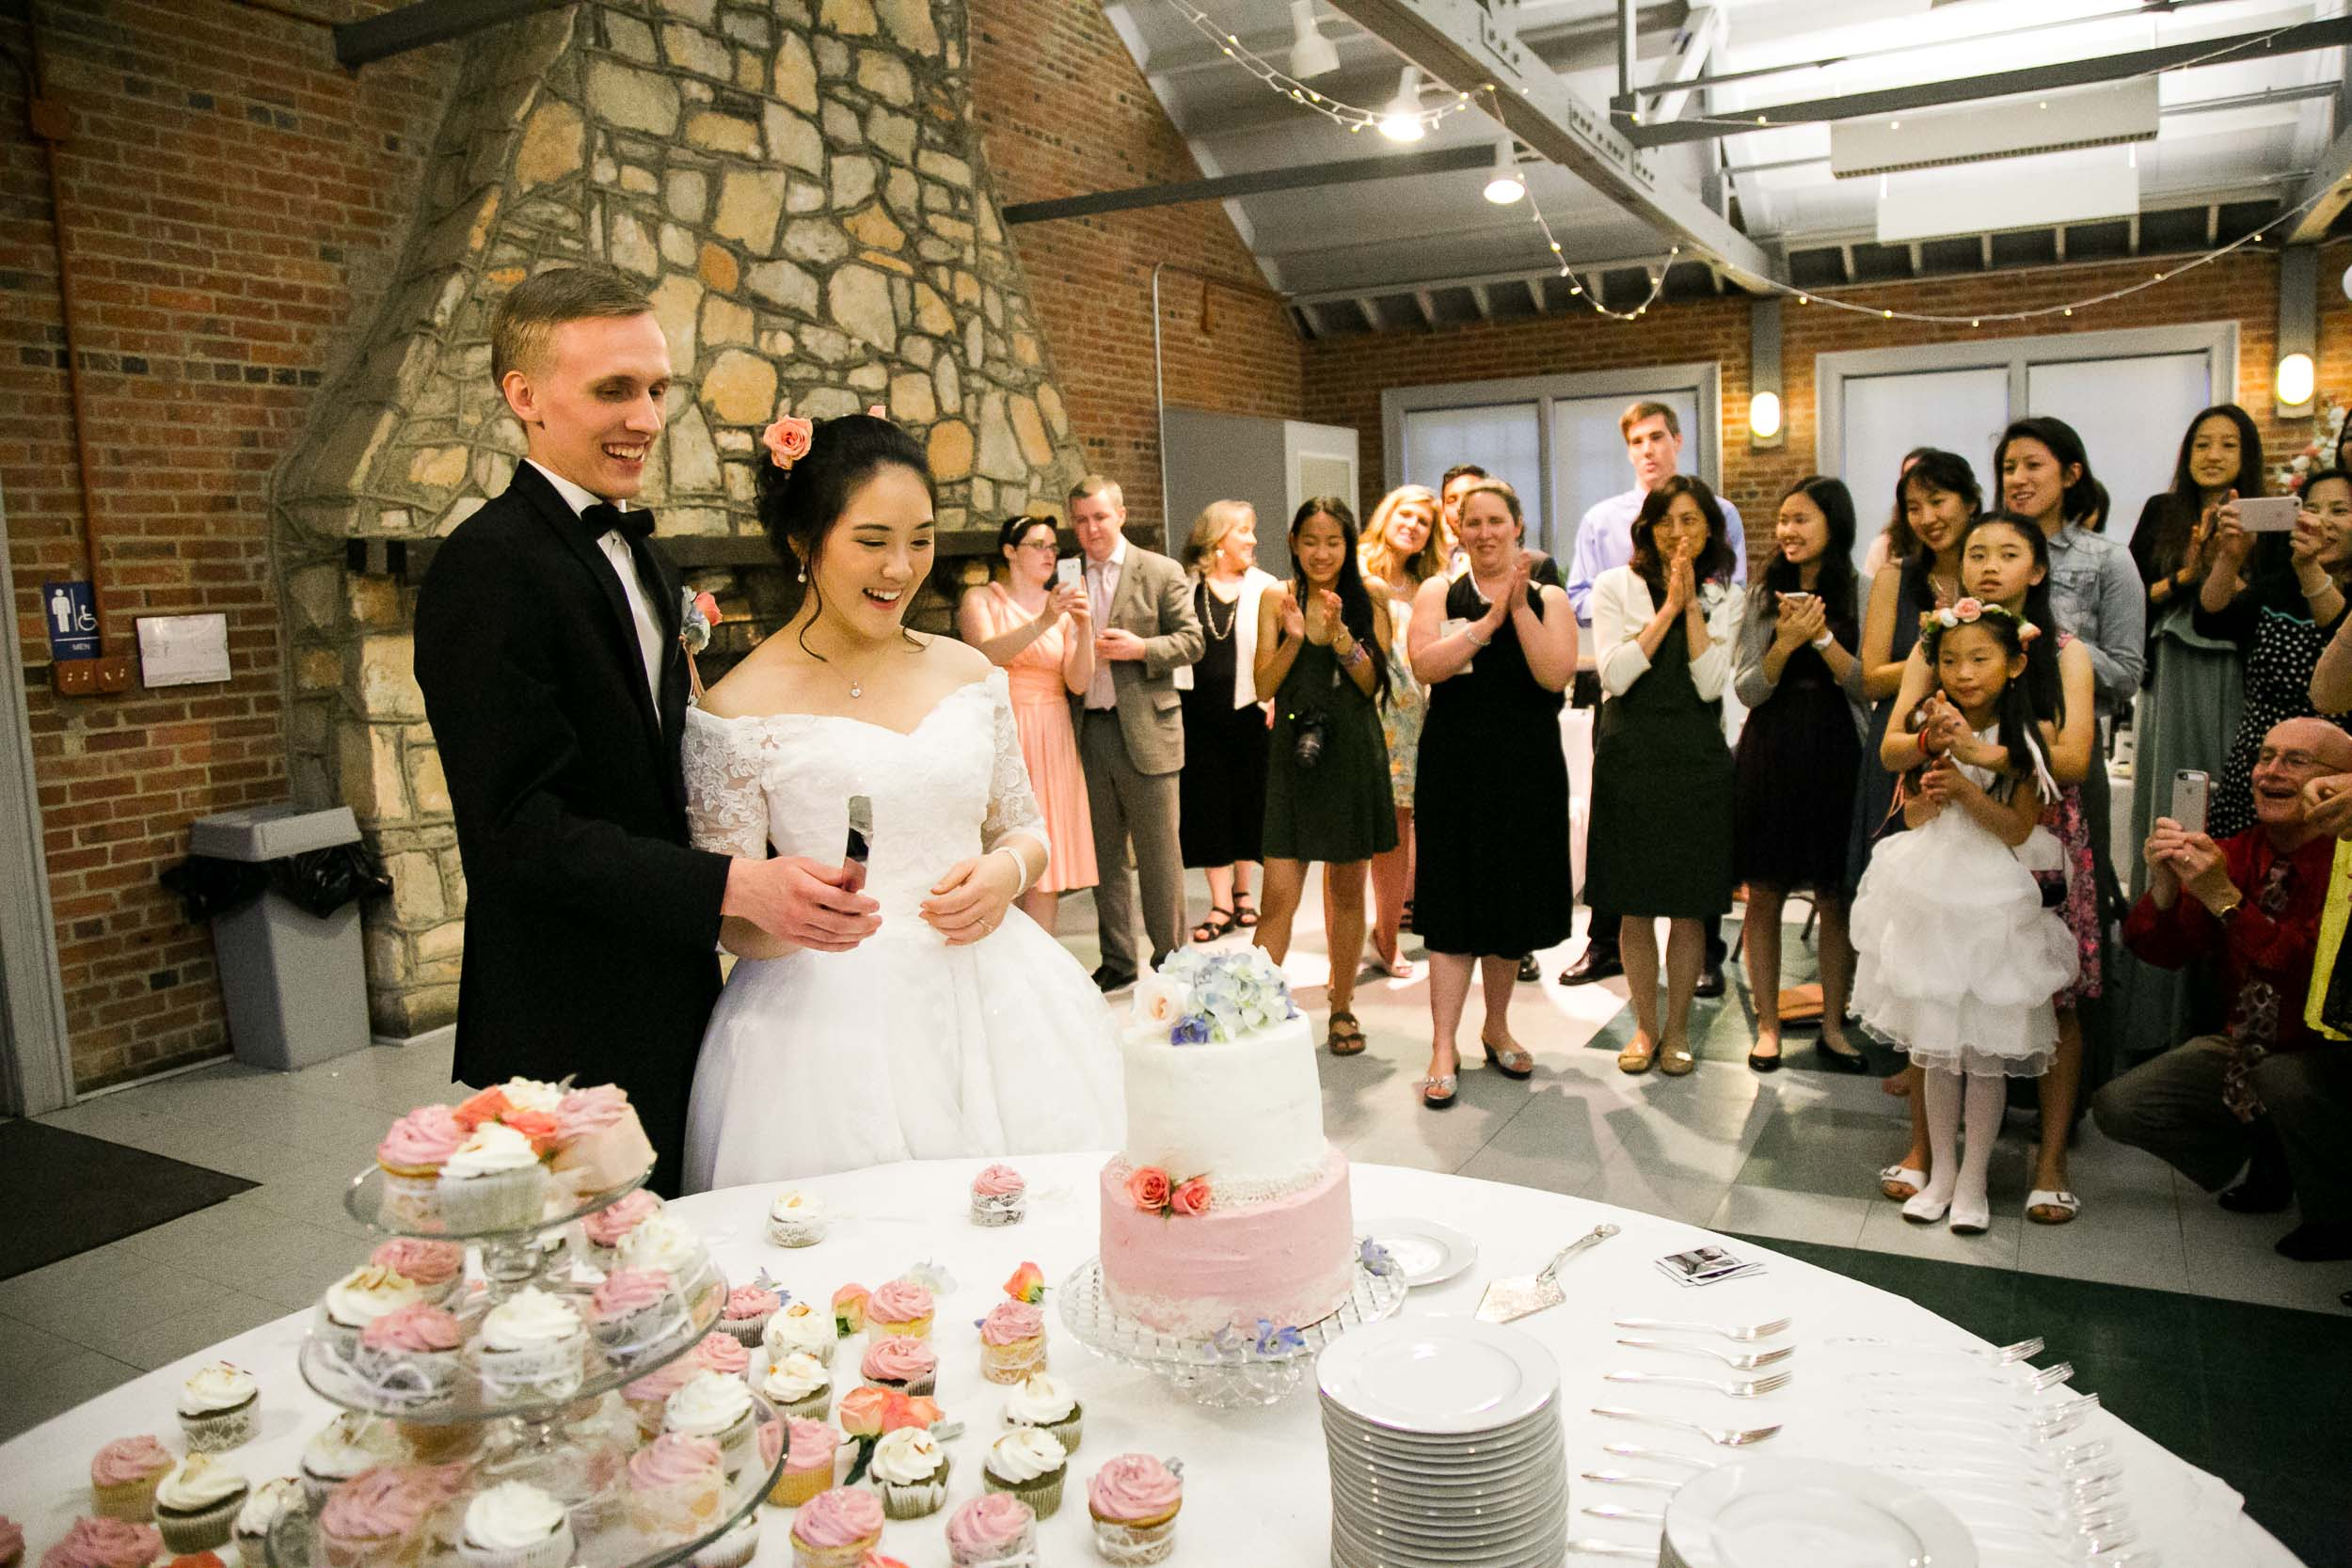 Raleigh Wedding Photographer | G. Lin Photography | Bride and groom cutting the wedding cake